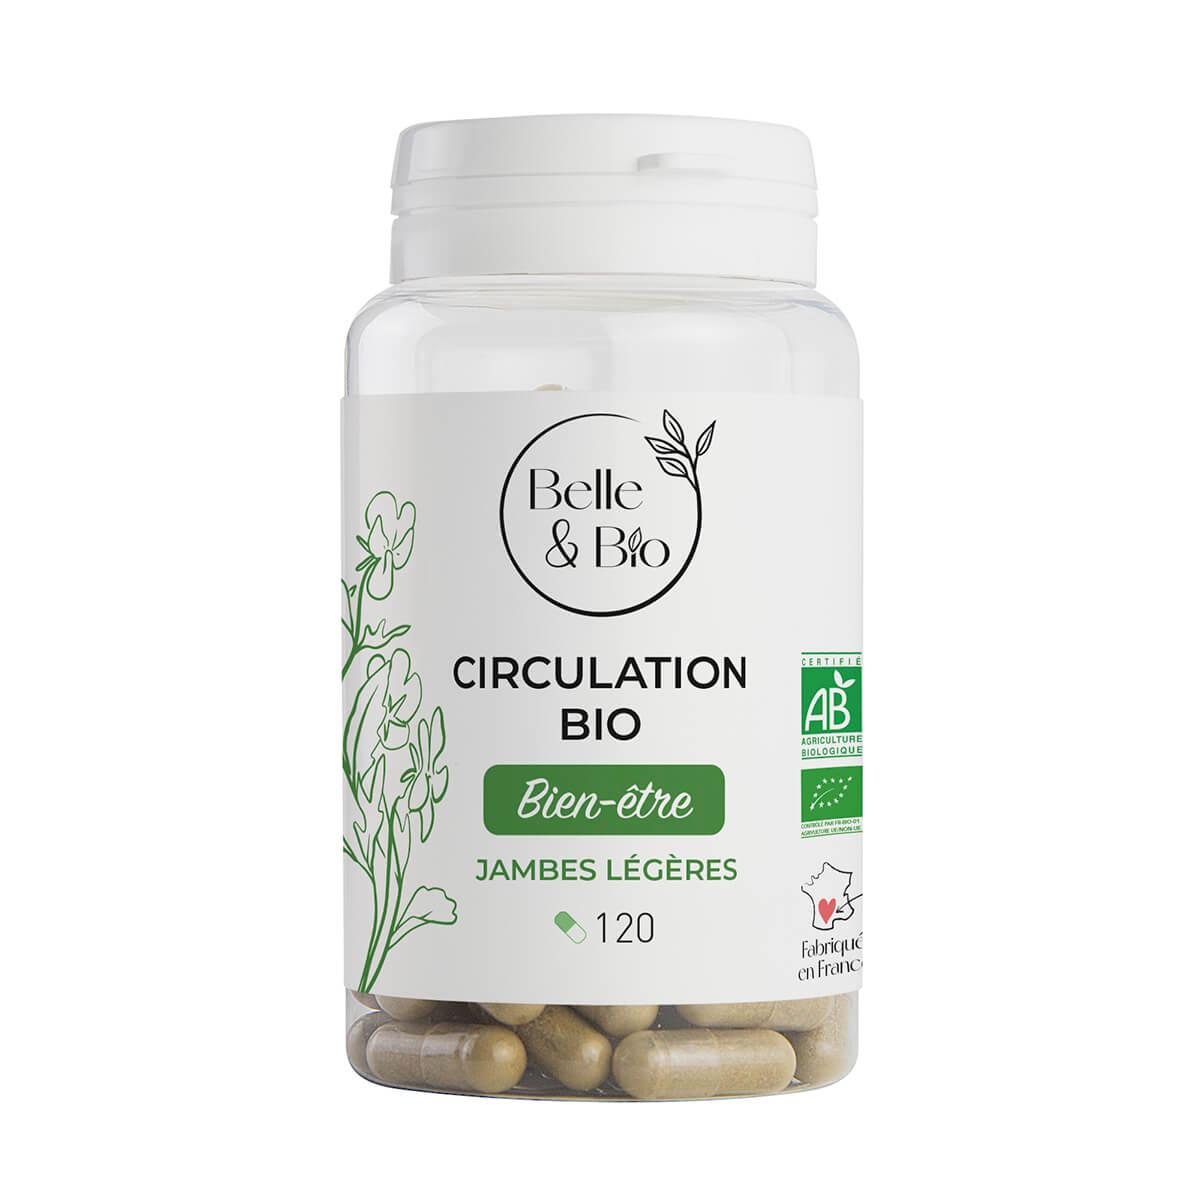 Belle & Bio - Circulation Bio - 120 Gelules - Certifie AB par Ecocert